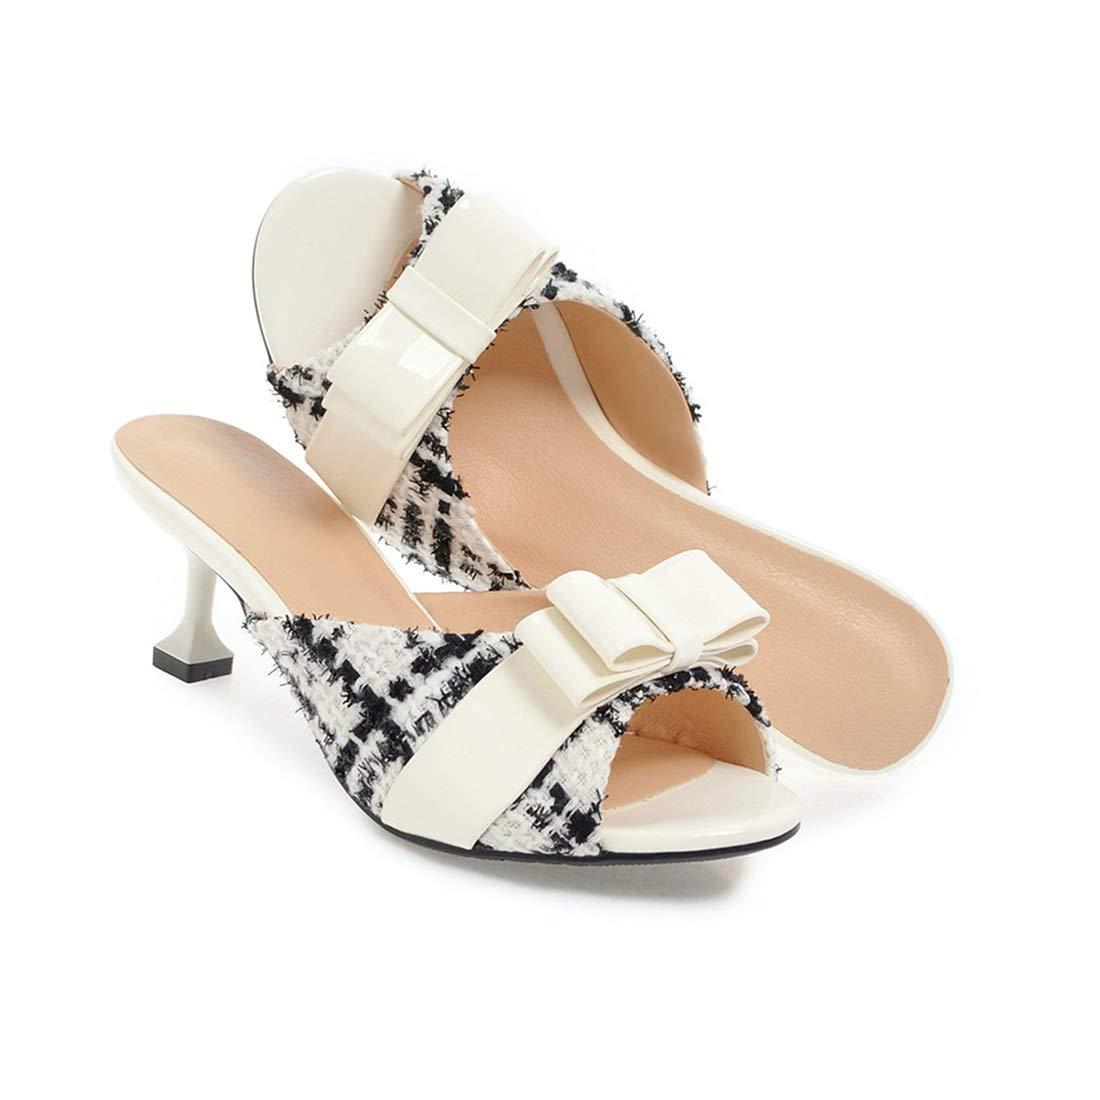 Eora-2sl Summer Ladies Shoes peep Toe Shallow Elegant Mules Shoes Heel 5.5cm Women Slippers